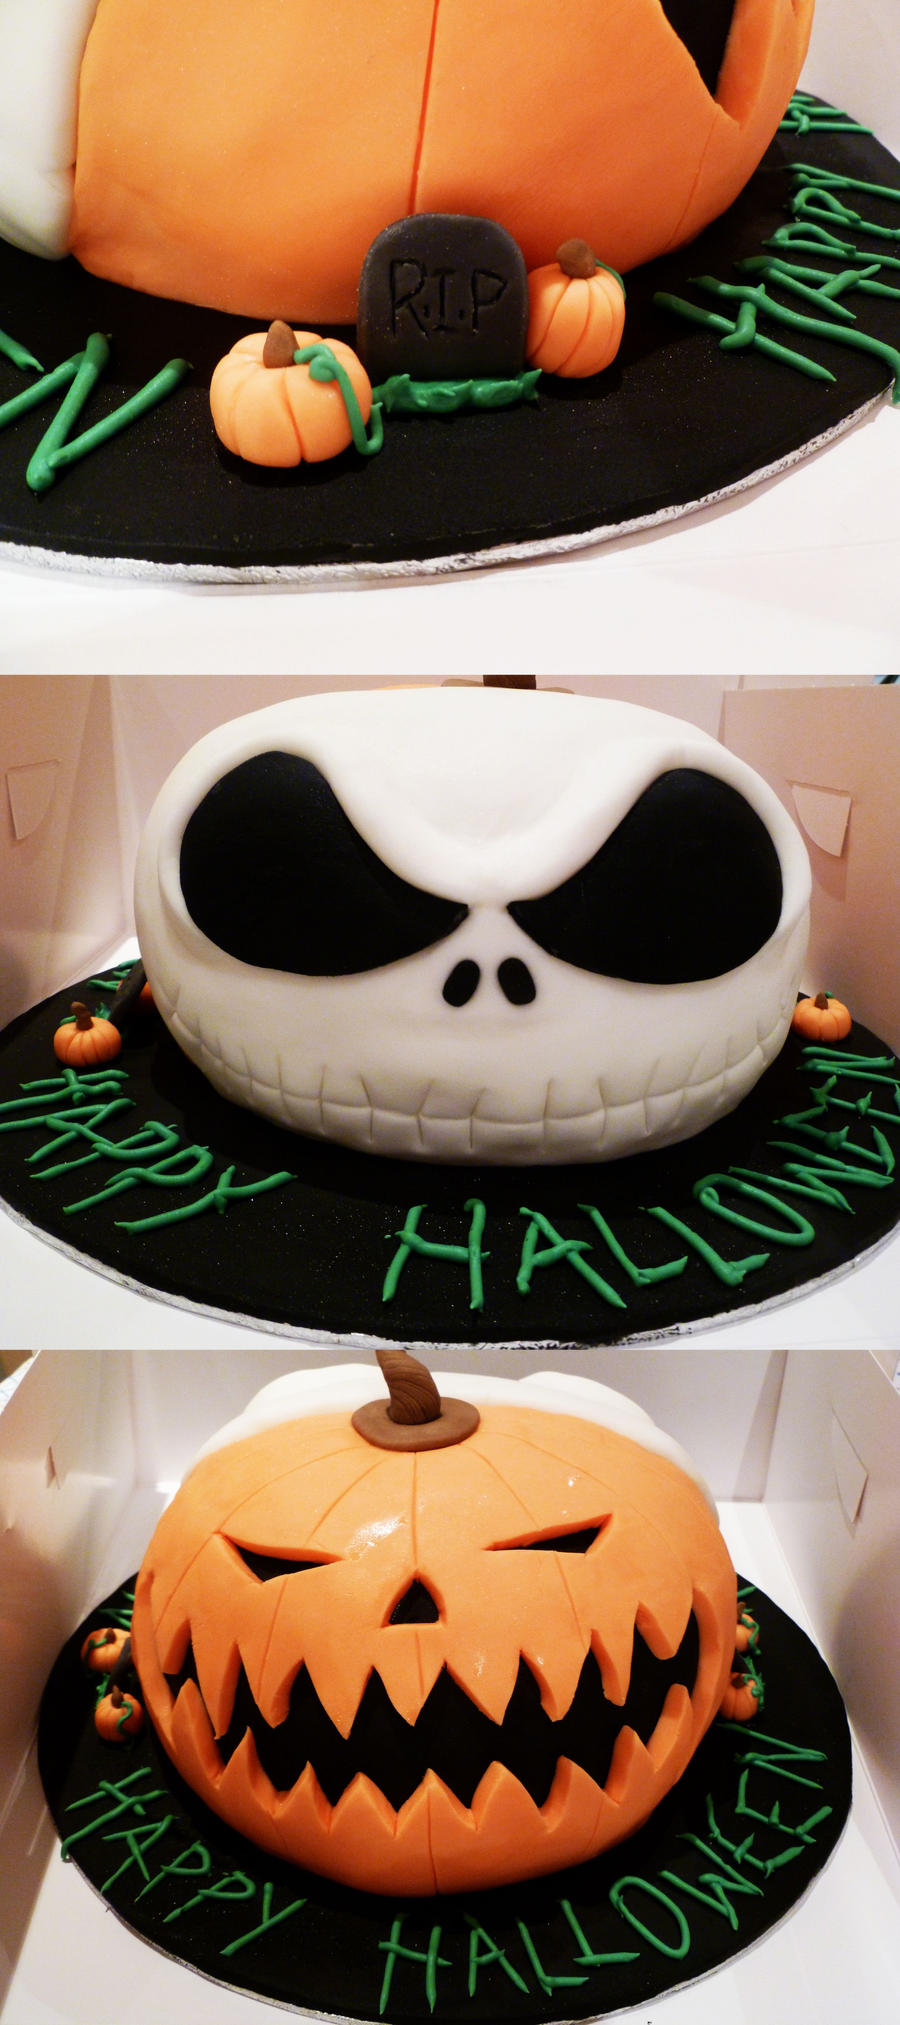 Jack Skellington Pumpkin Cake by Rebeckington